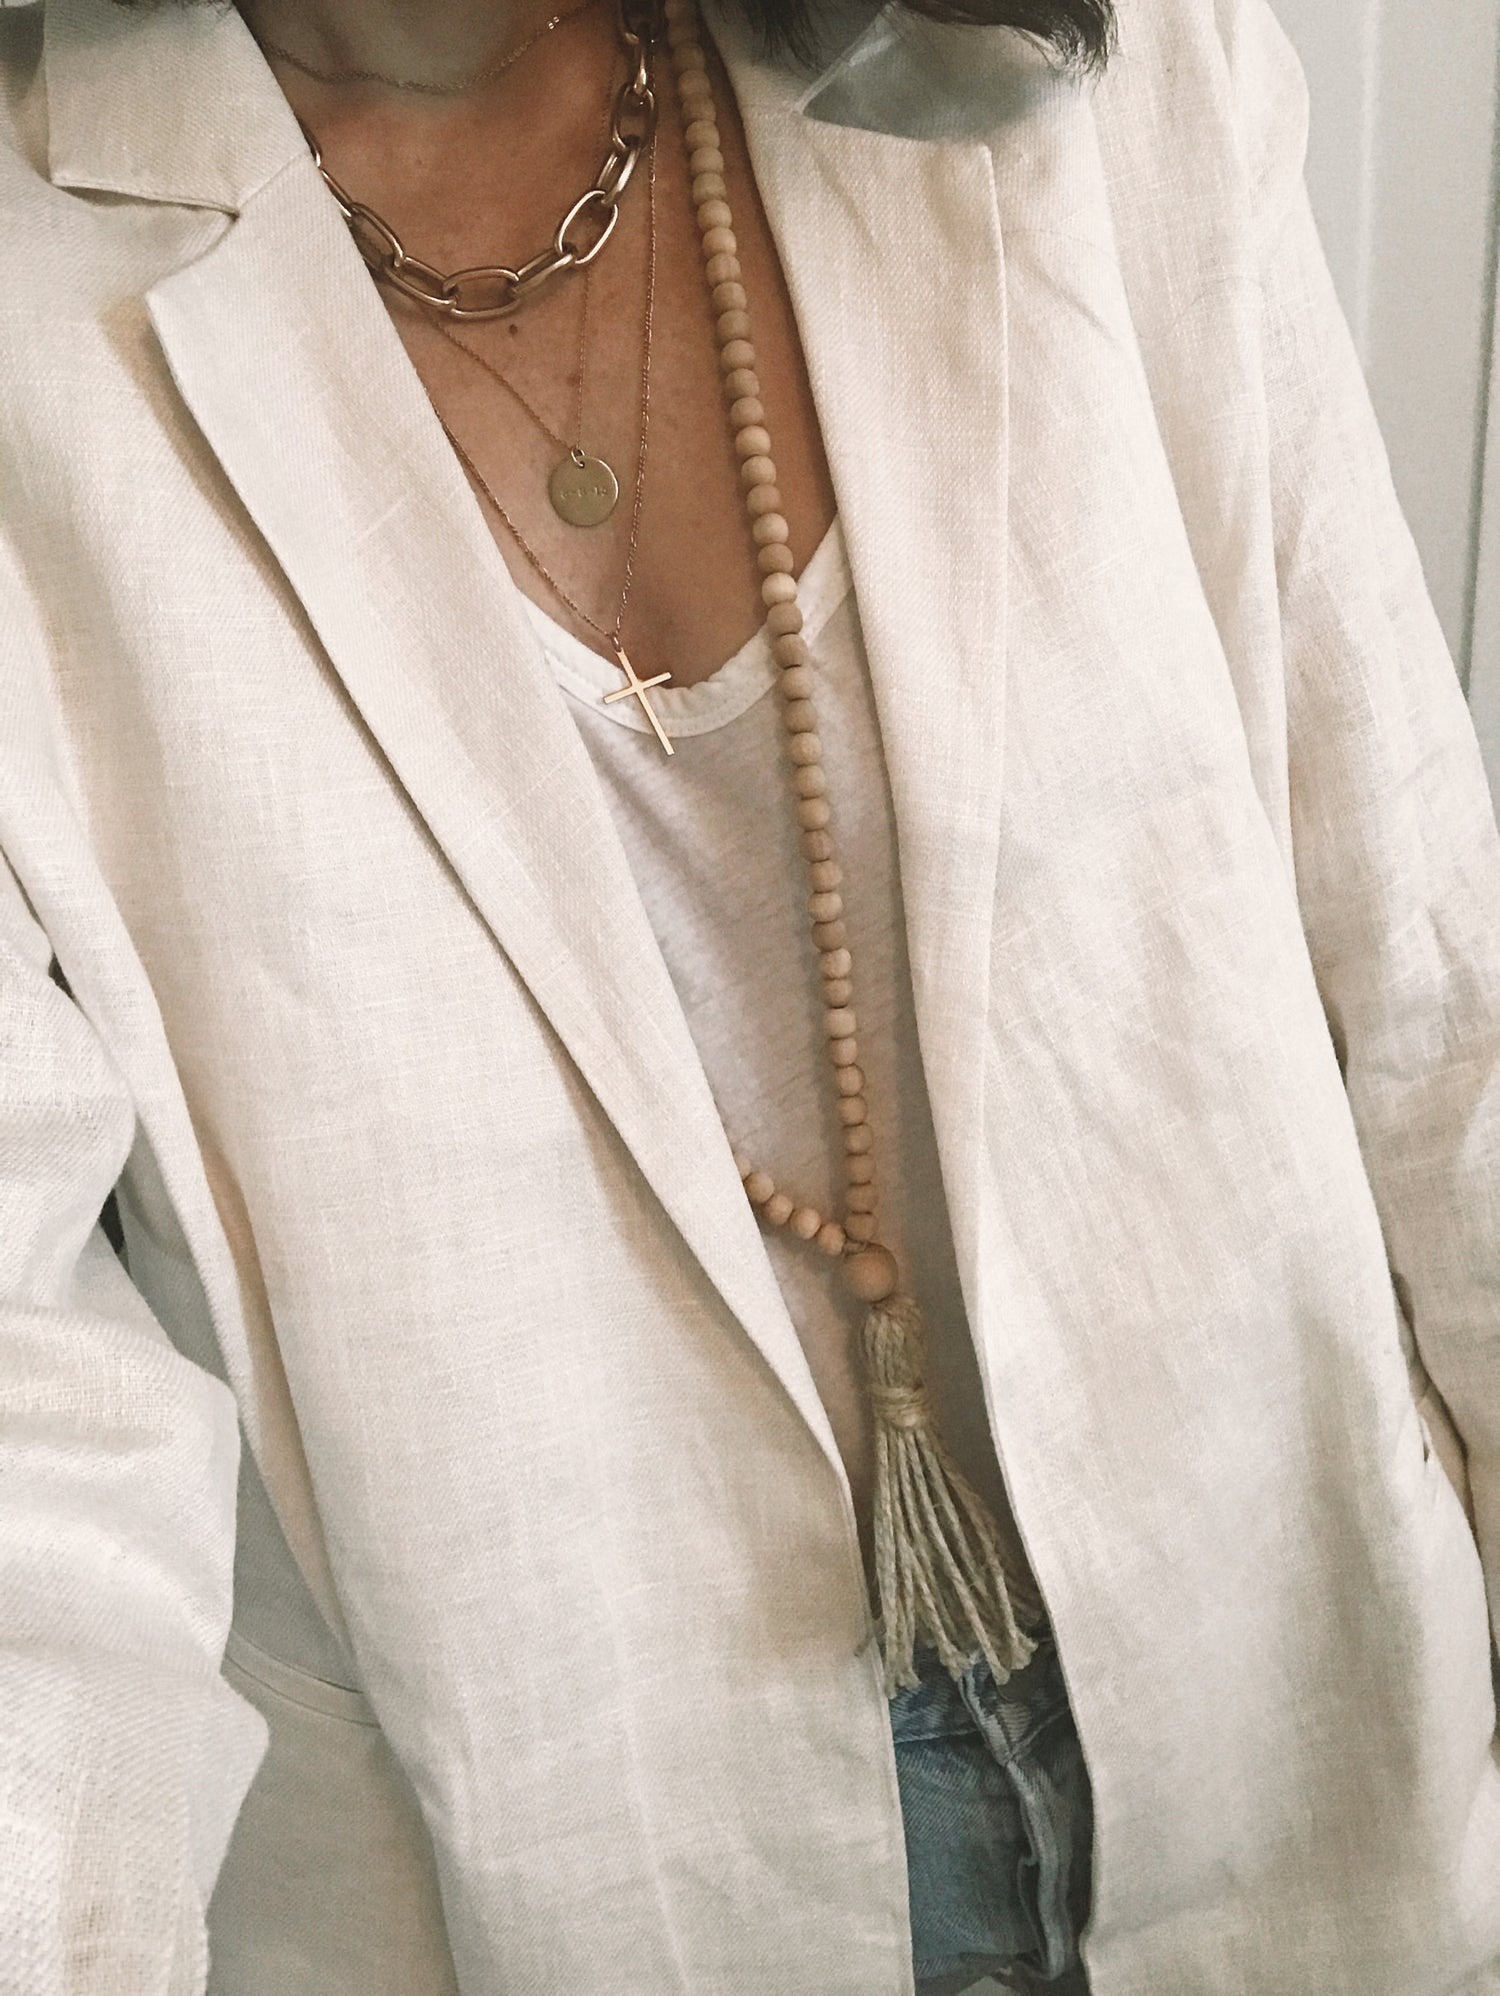 Image of Hemp Tassel Necklace - 'Dried Palm'